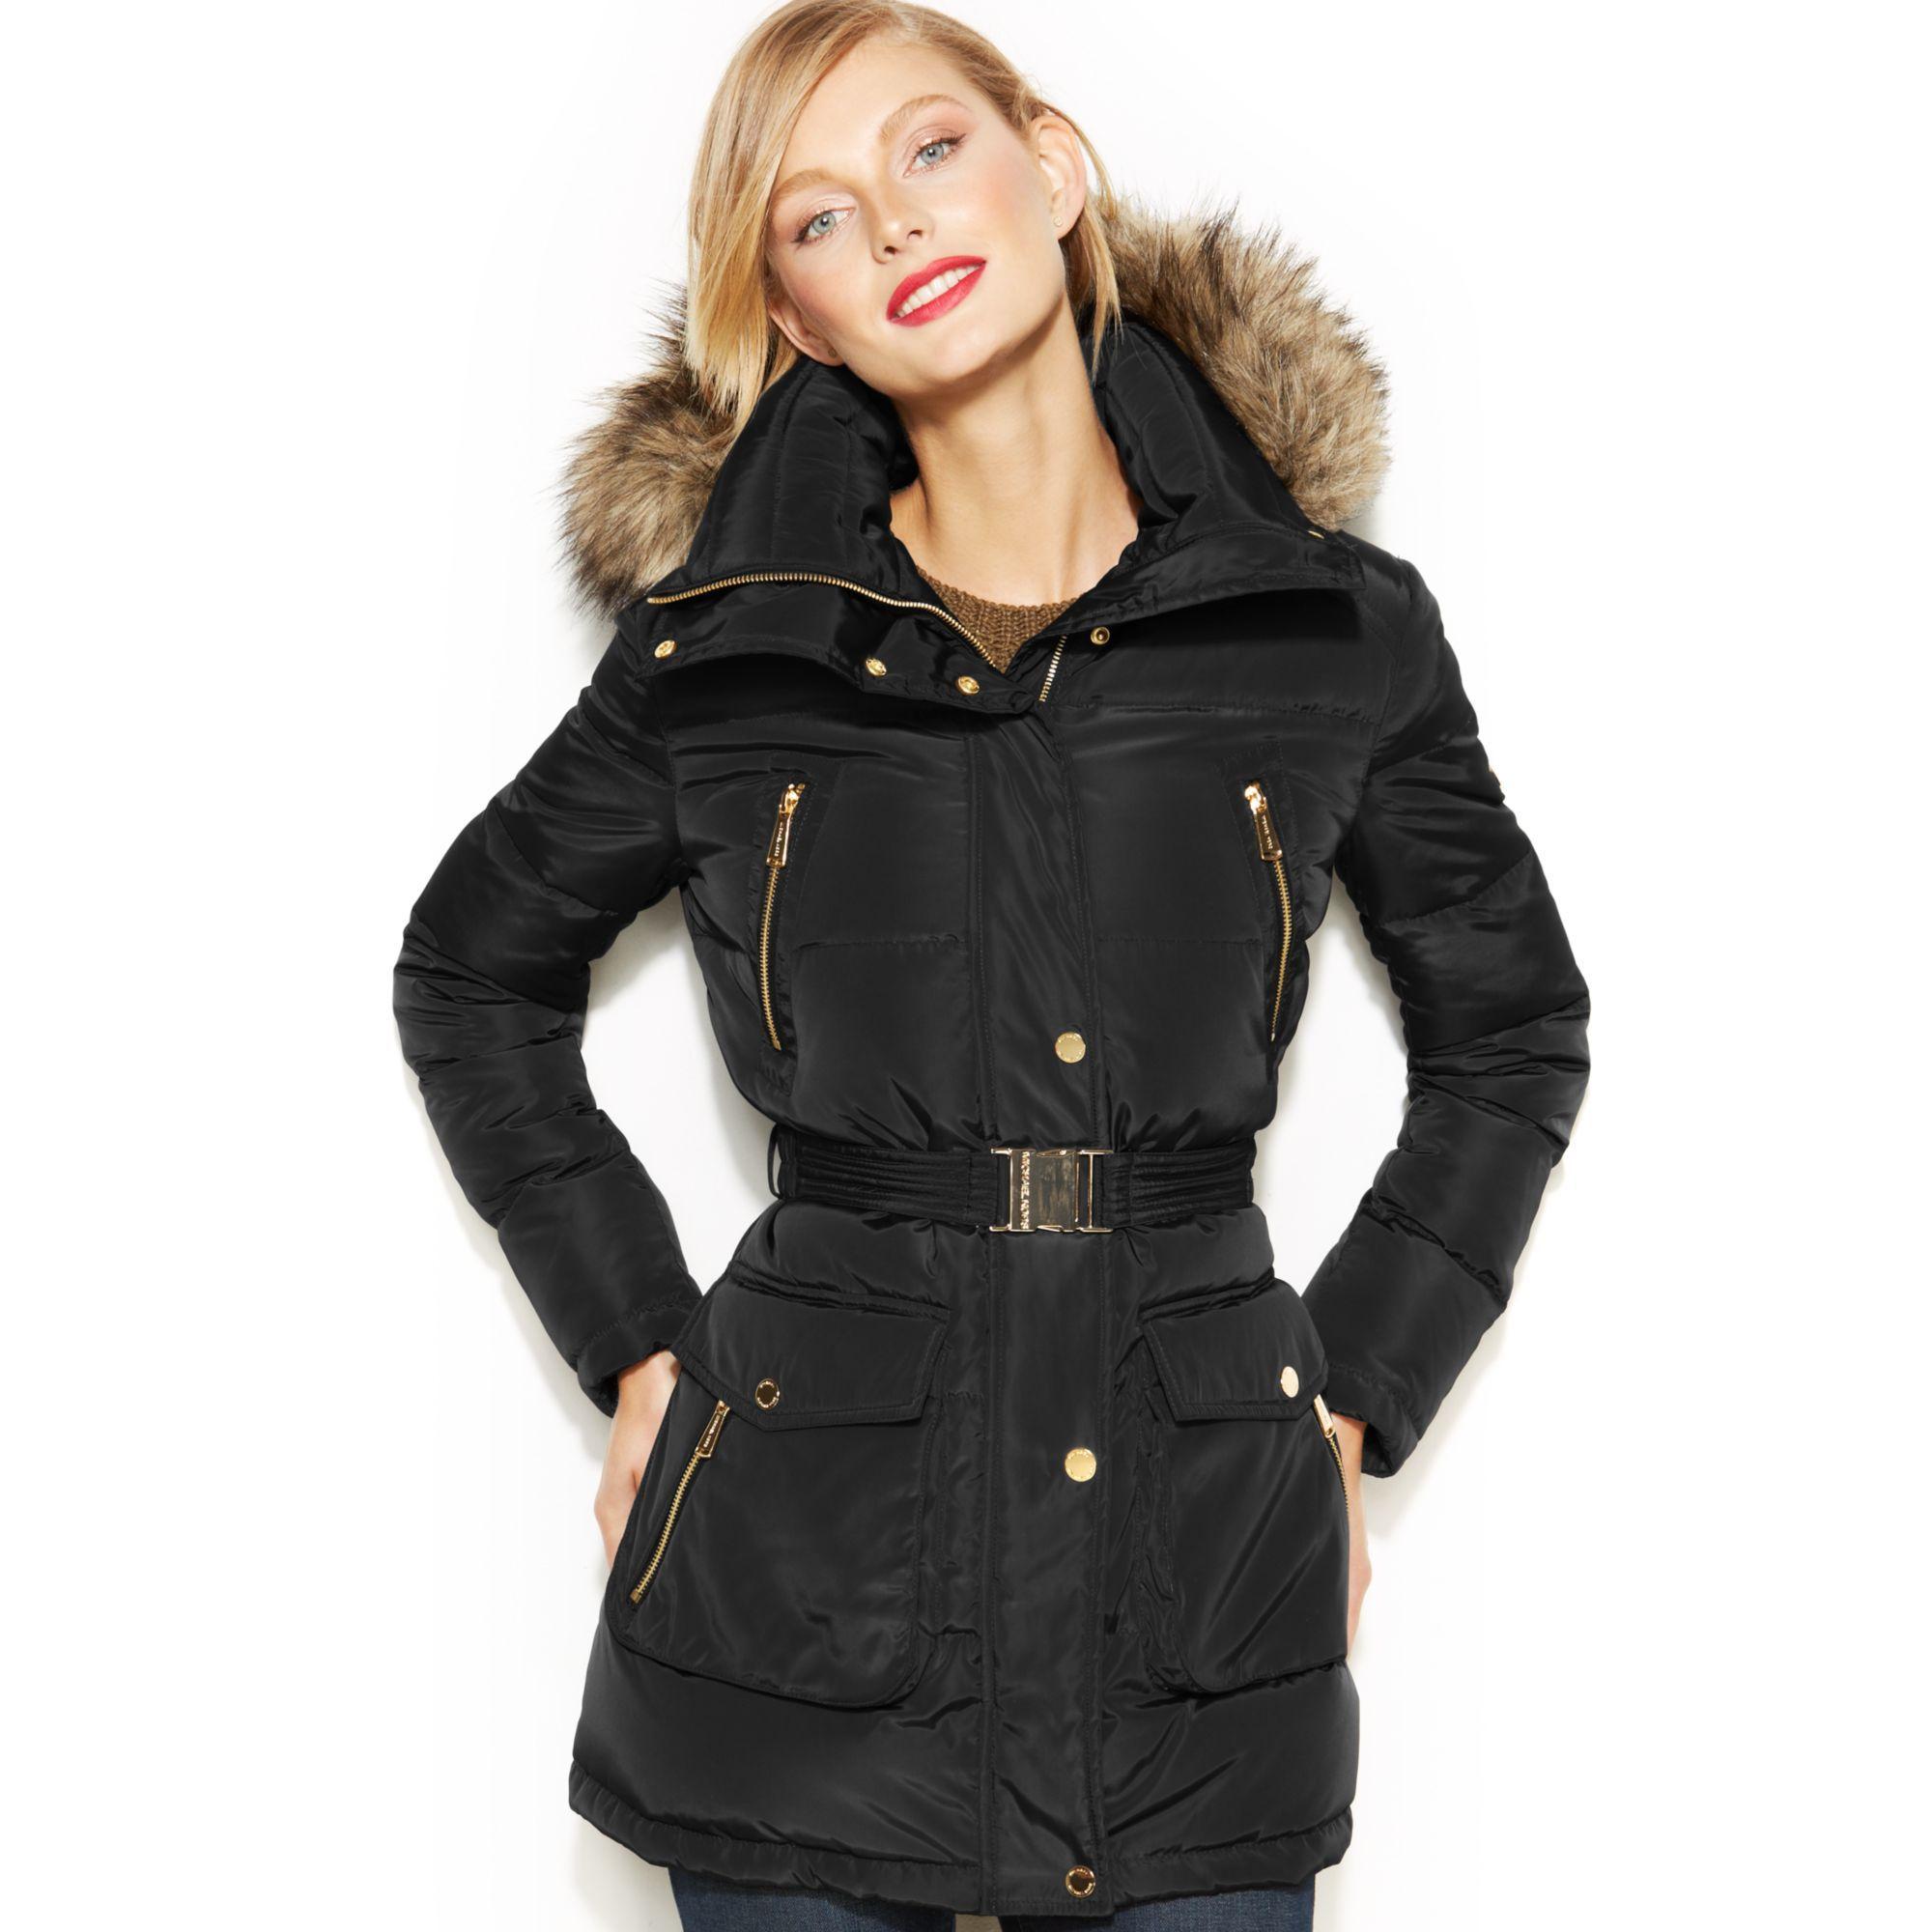 Michael Kors Coats Women S Winter Wool Trench Coats Lyst Michael Kors Puffer Coat Down Puffer Coat Coats For Women [ 2000 x 2000 Pixel ]